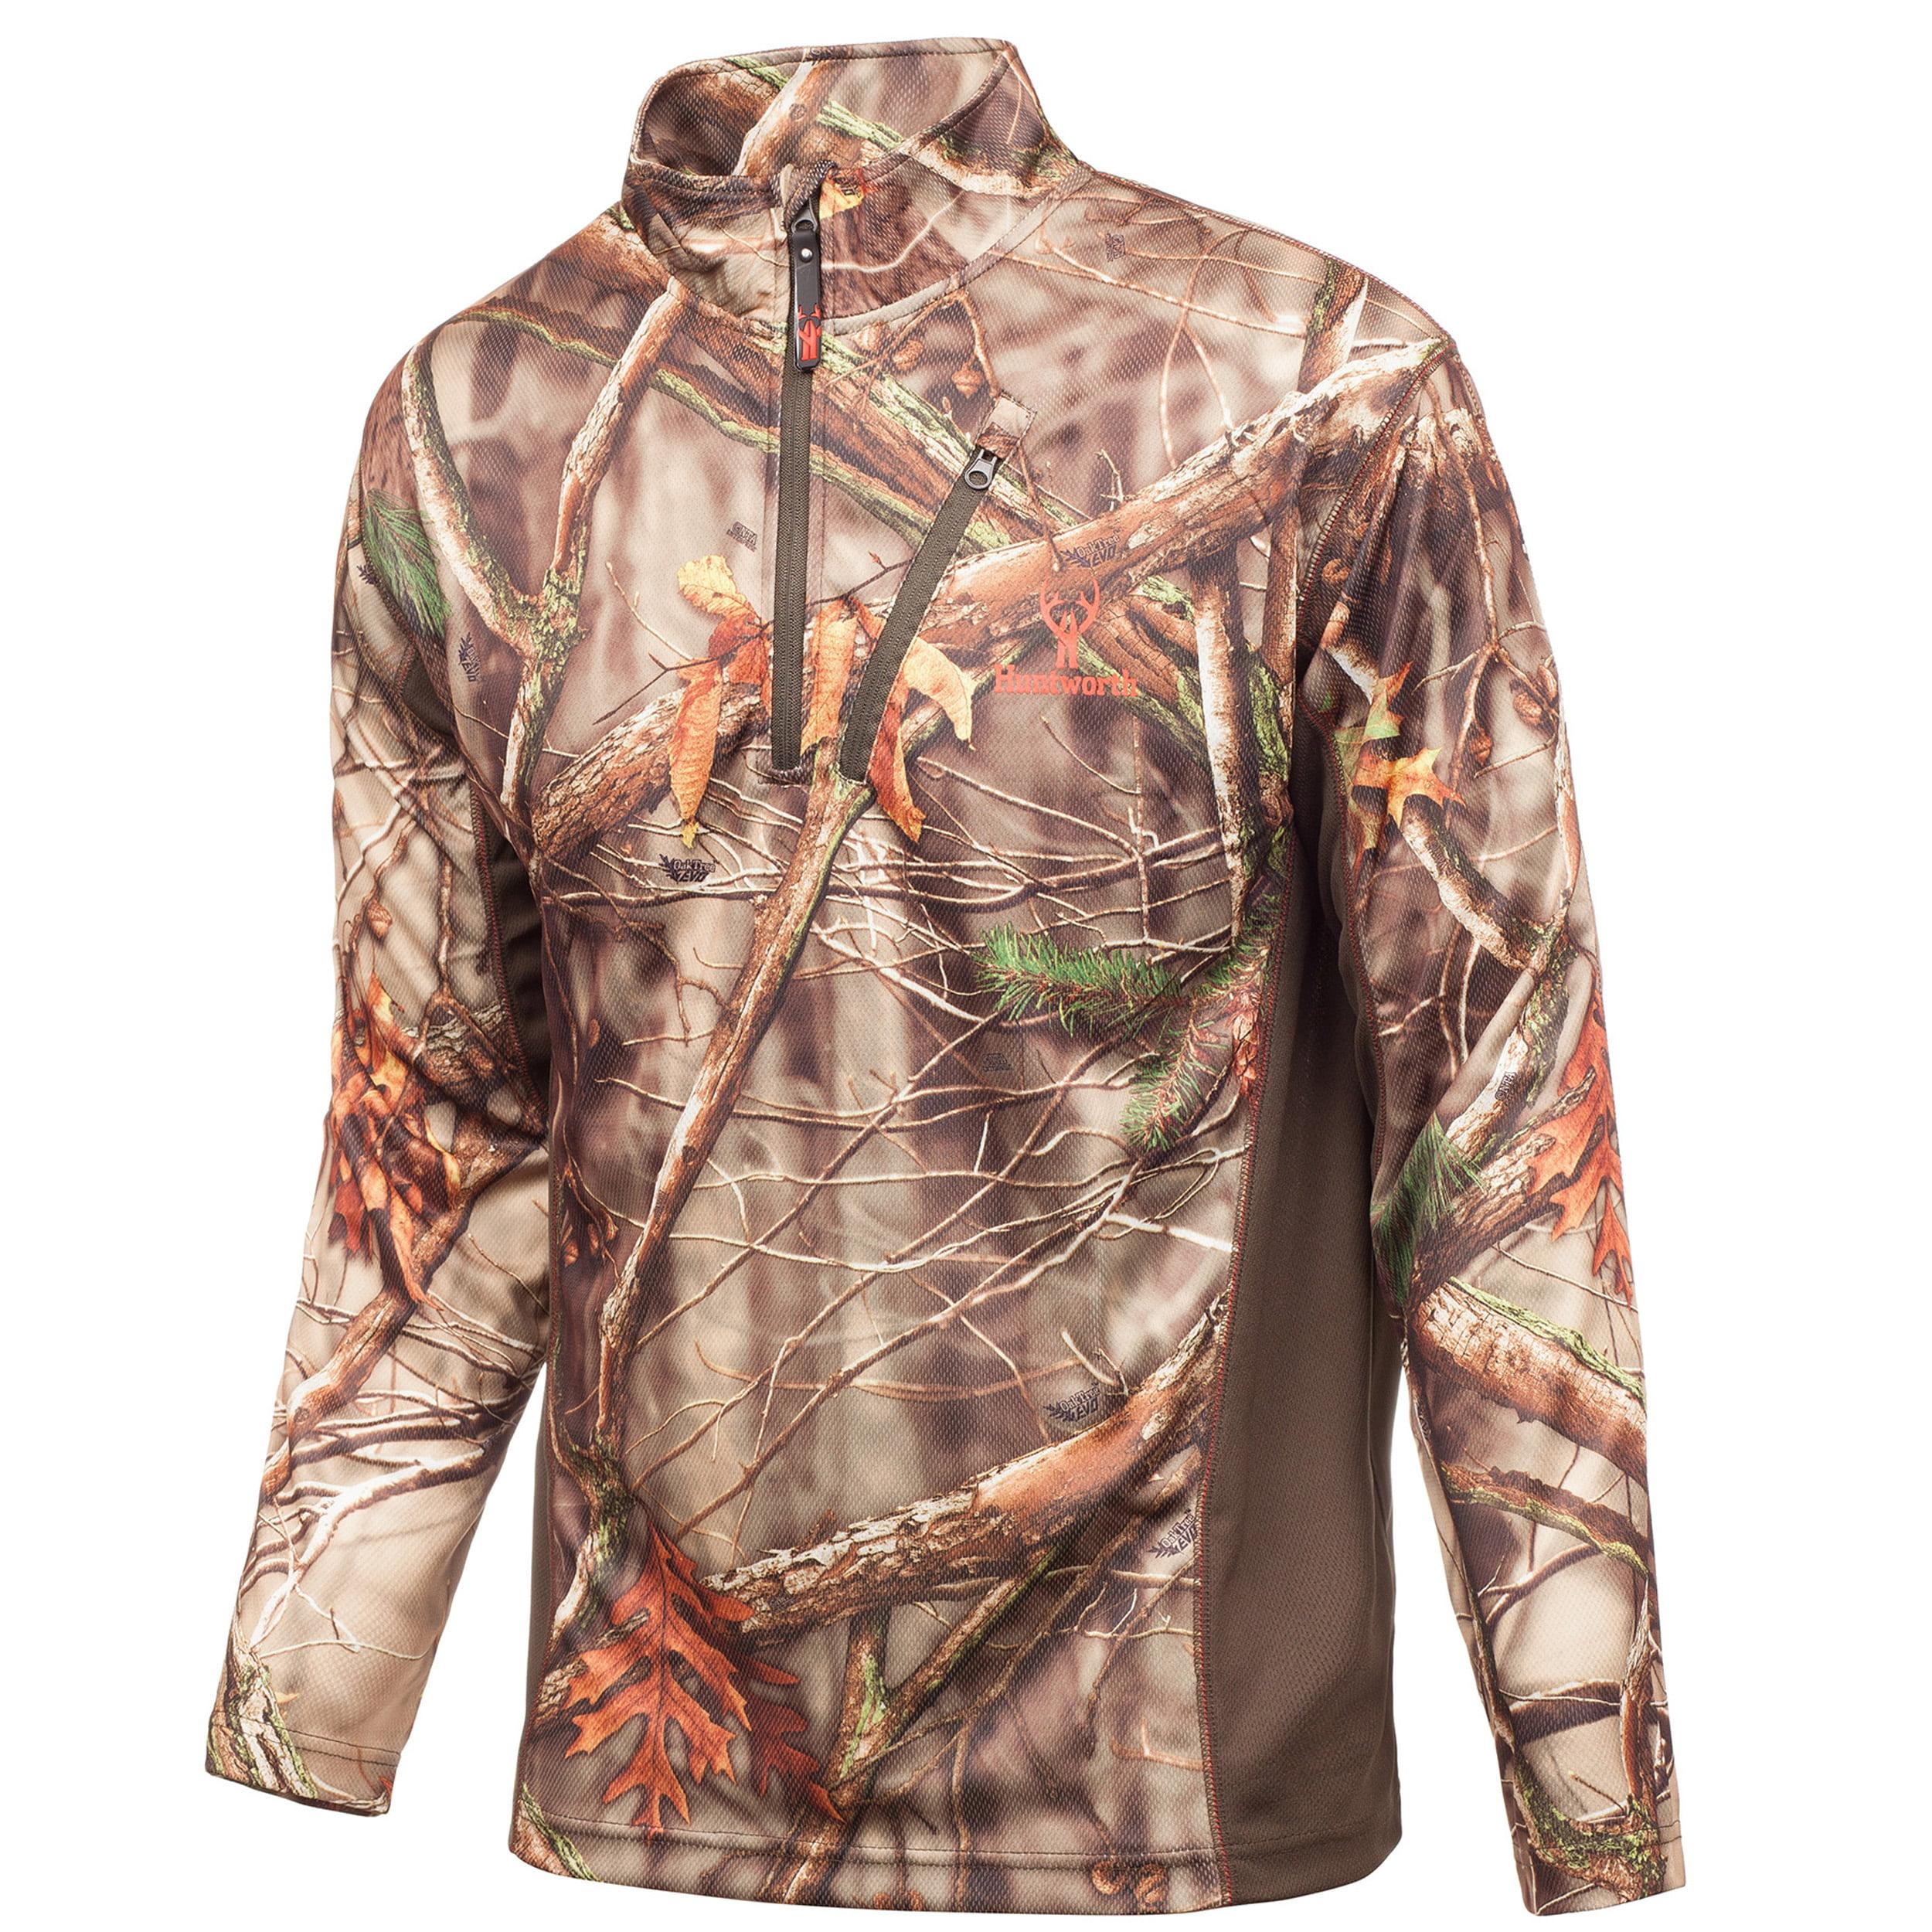 Men's Soft Shell Jacket Inner sorm flap by NTA Enterprise Inc